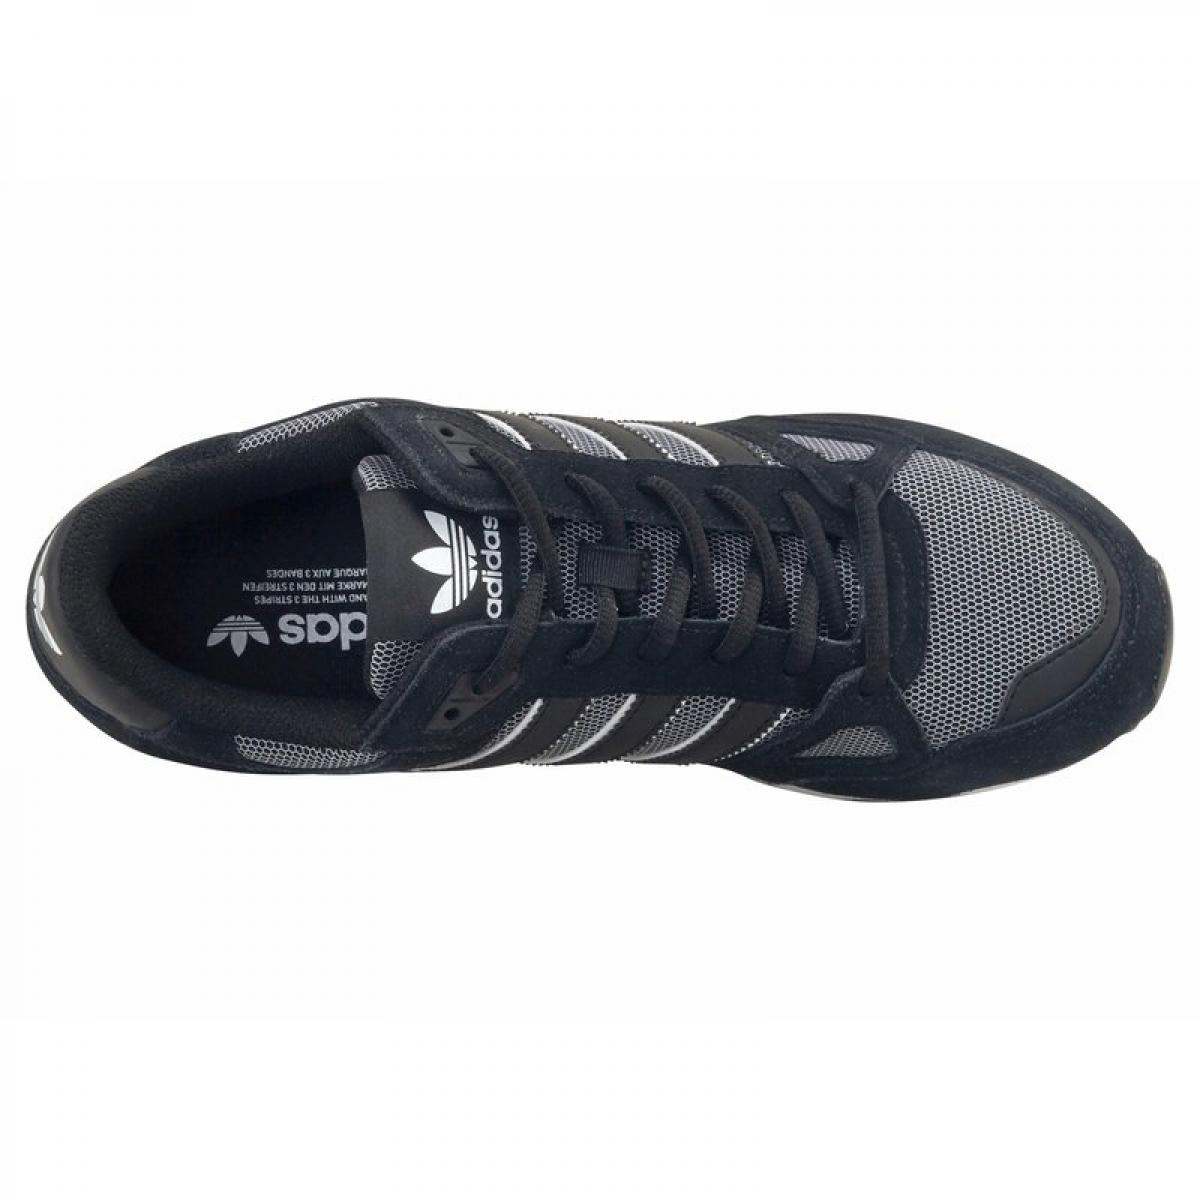 adidas Originals ZX 750 sneakers homme - Noir - Blanc Adidas ...